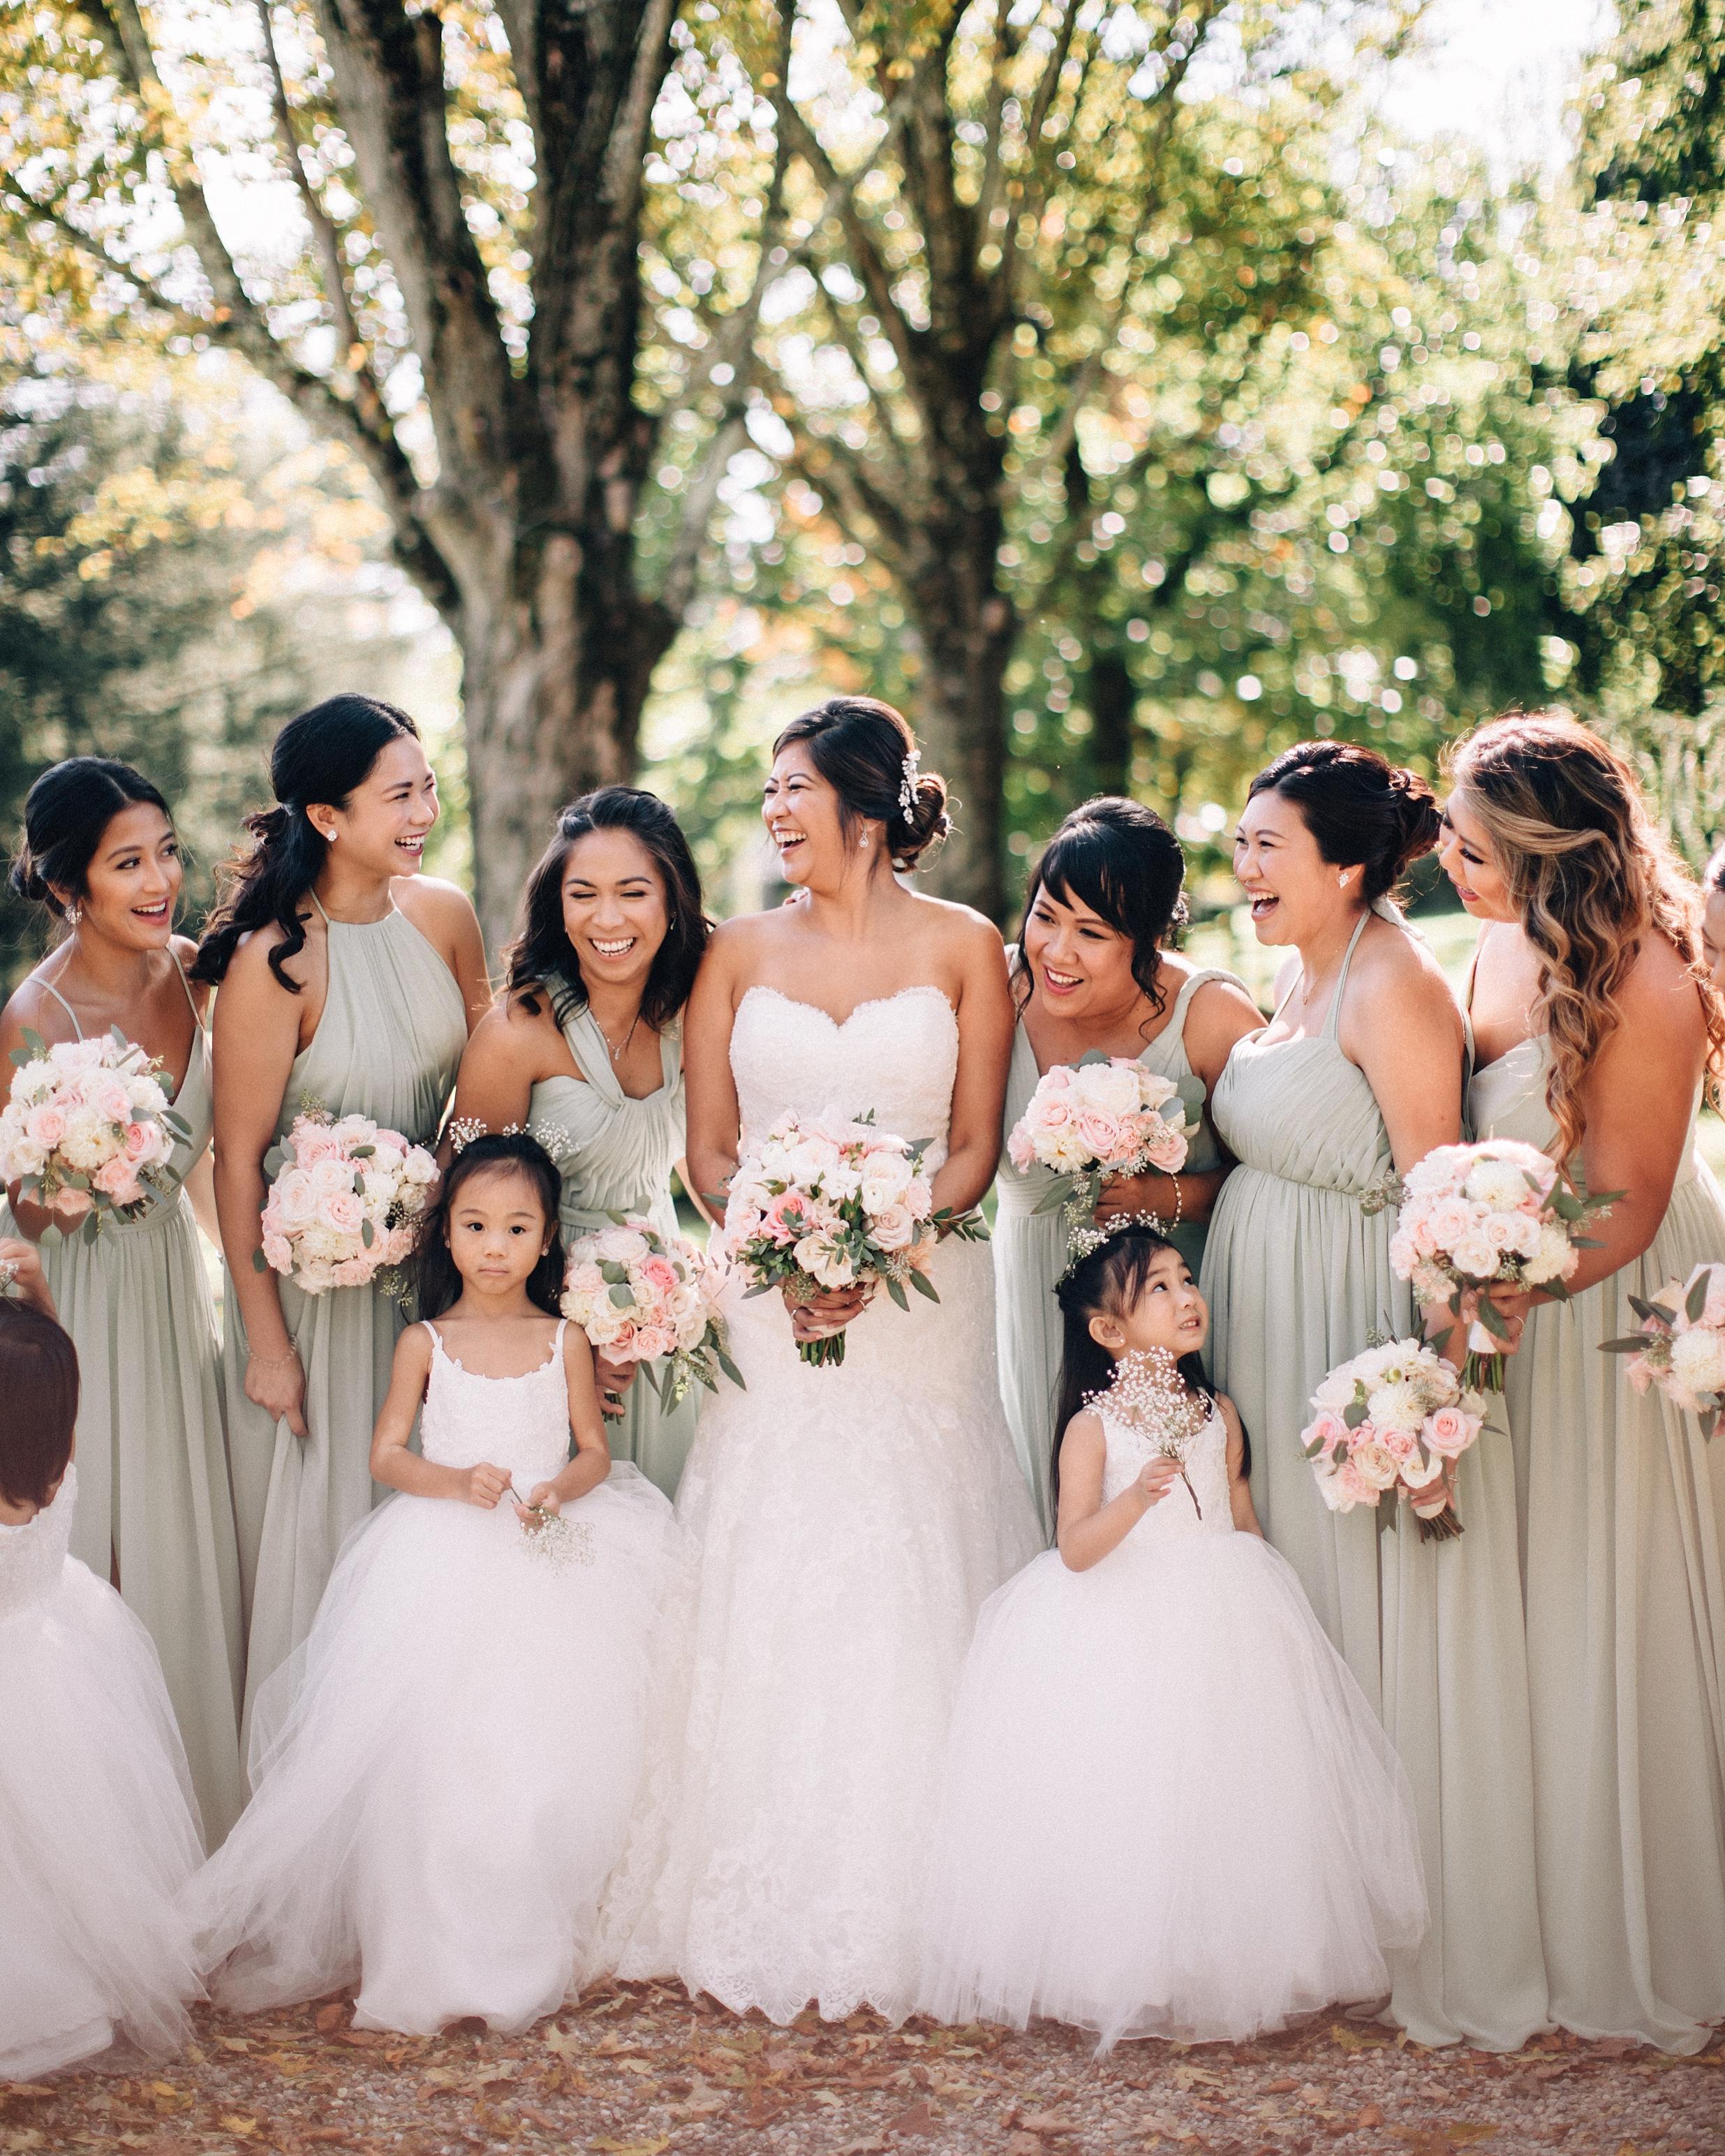 crossed-keys-estate-filipino-wedding-nj_0022.jpg